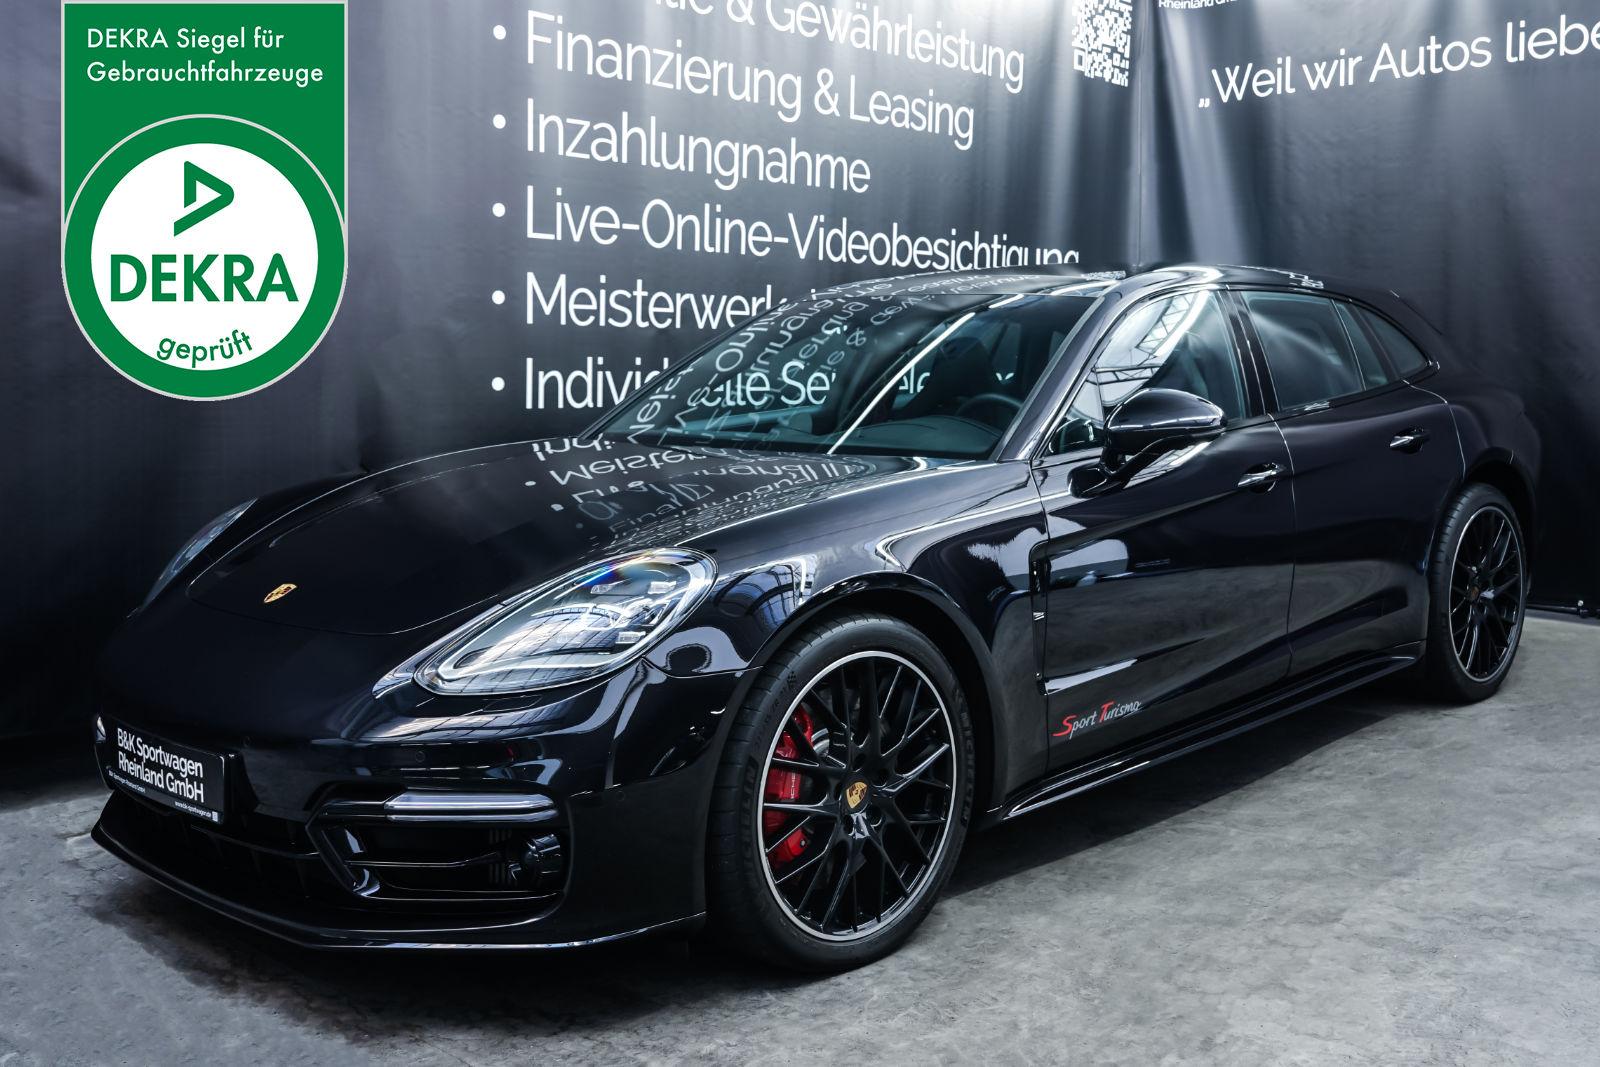 Porsche_Panamera_SportTurismo_Turbo_Schwarz_Schwarz_POR-5145_Plakette_w